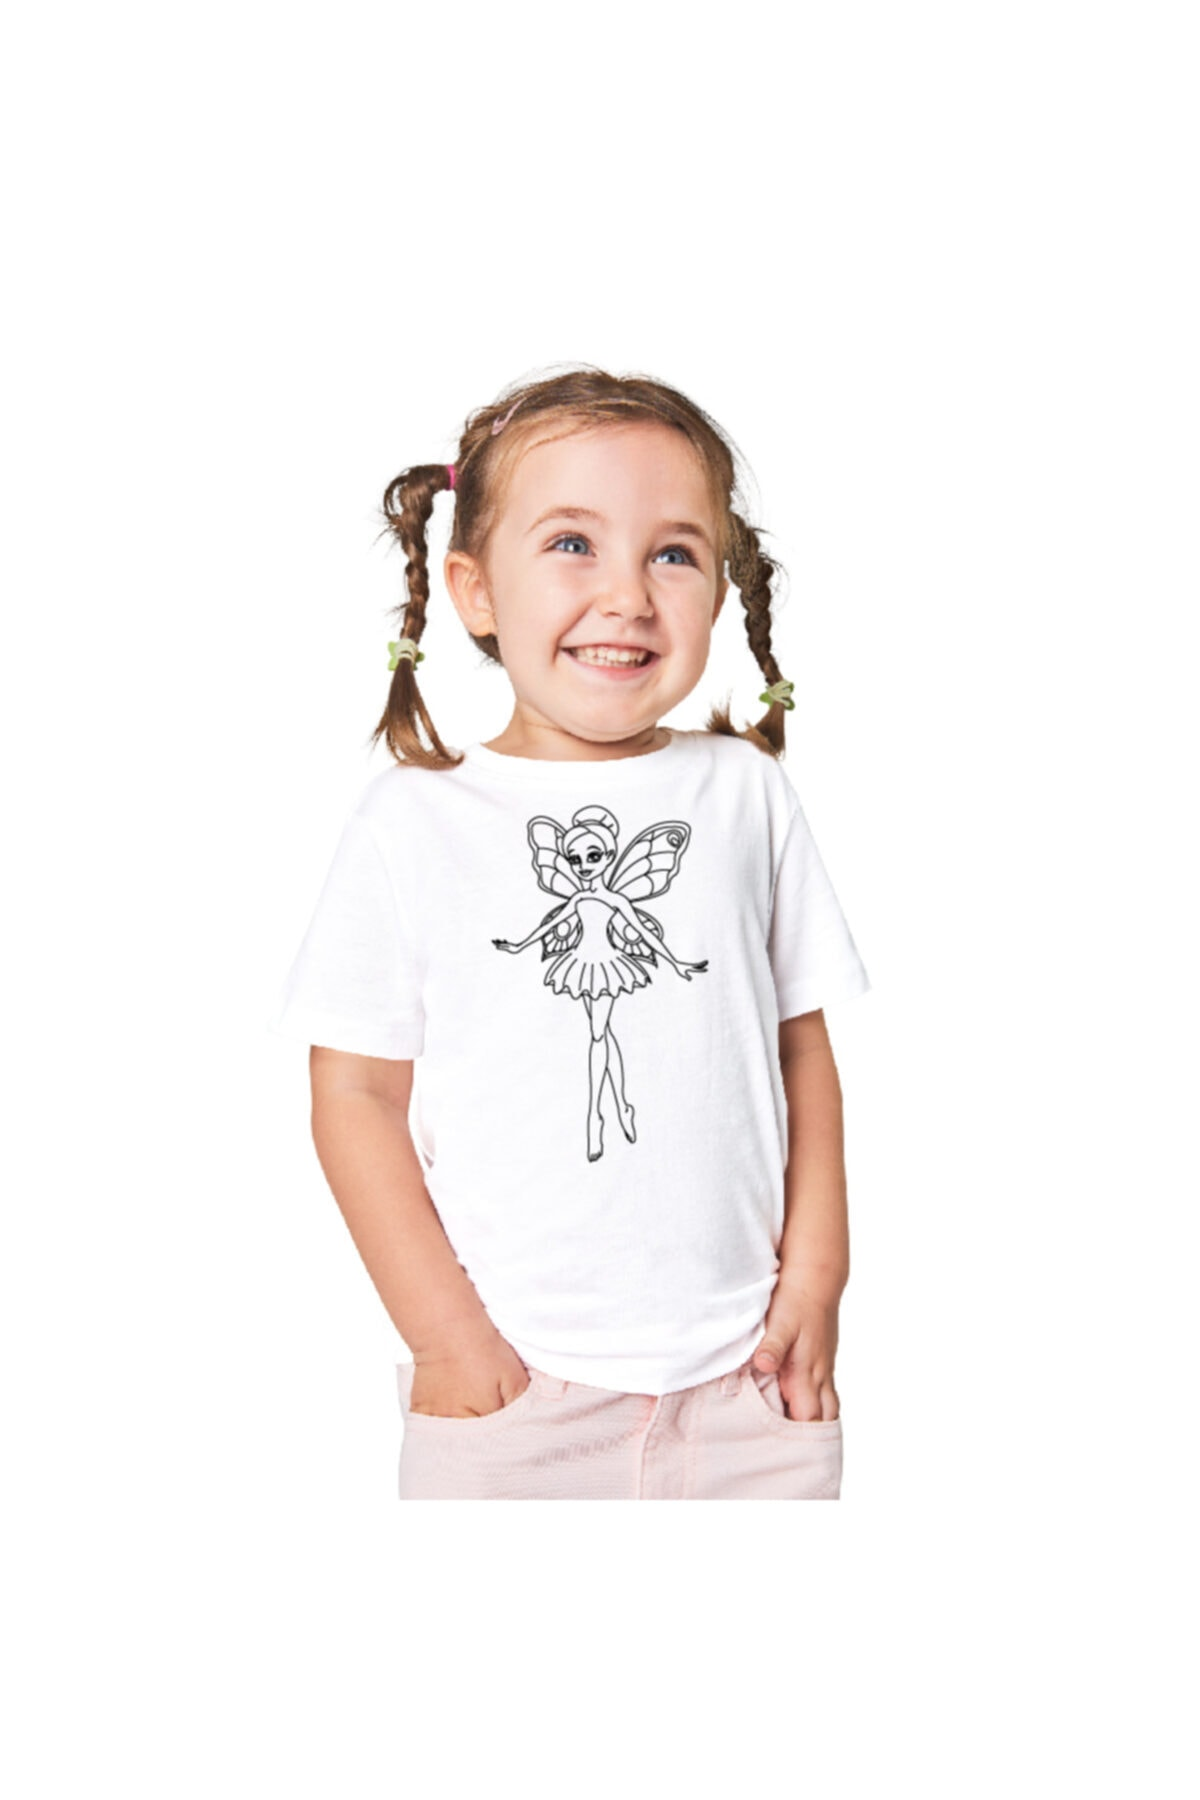 paint-wear Peri Boyama T-shirt 4-6 Yaş 2